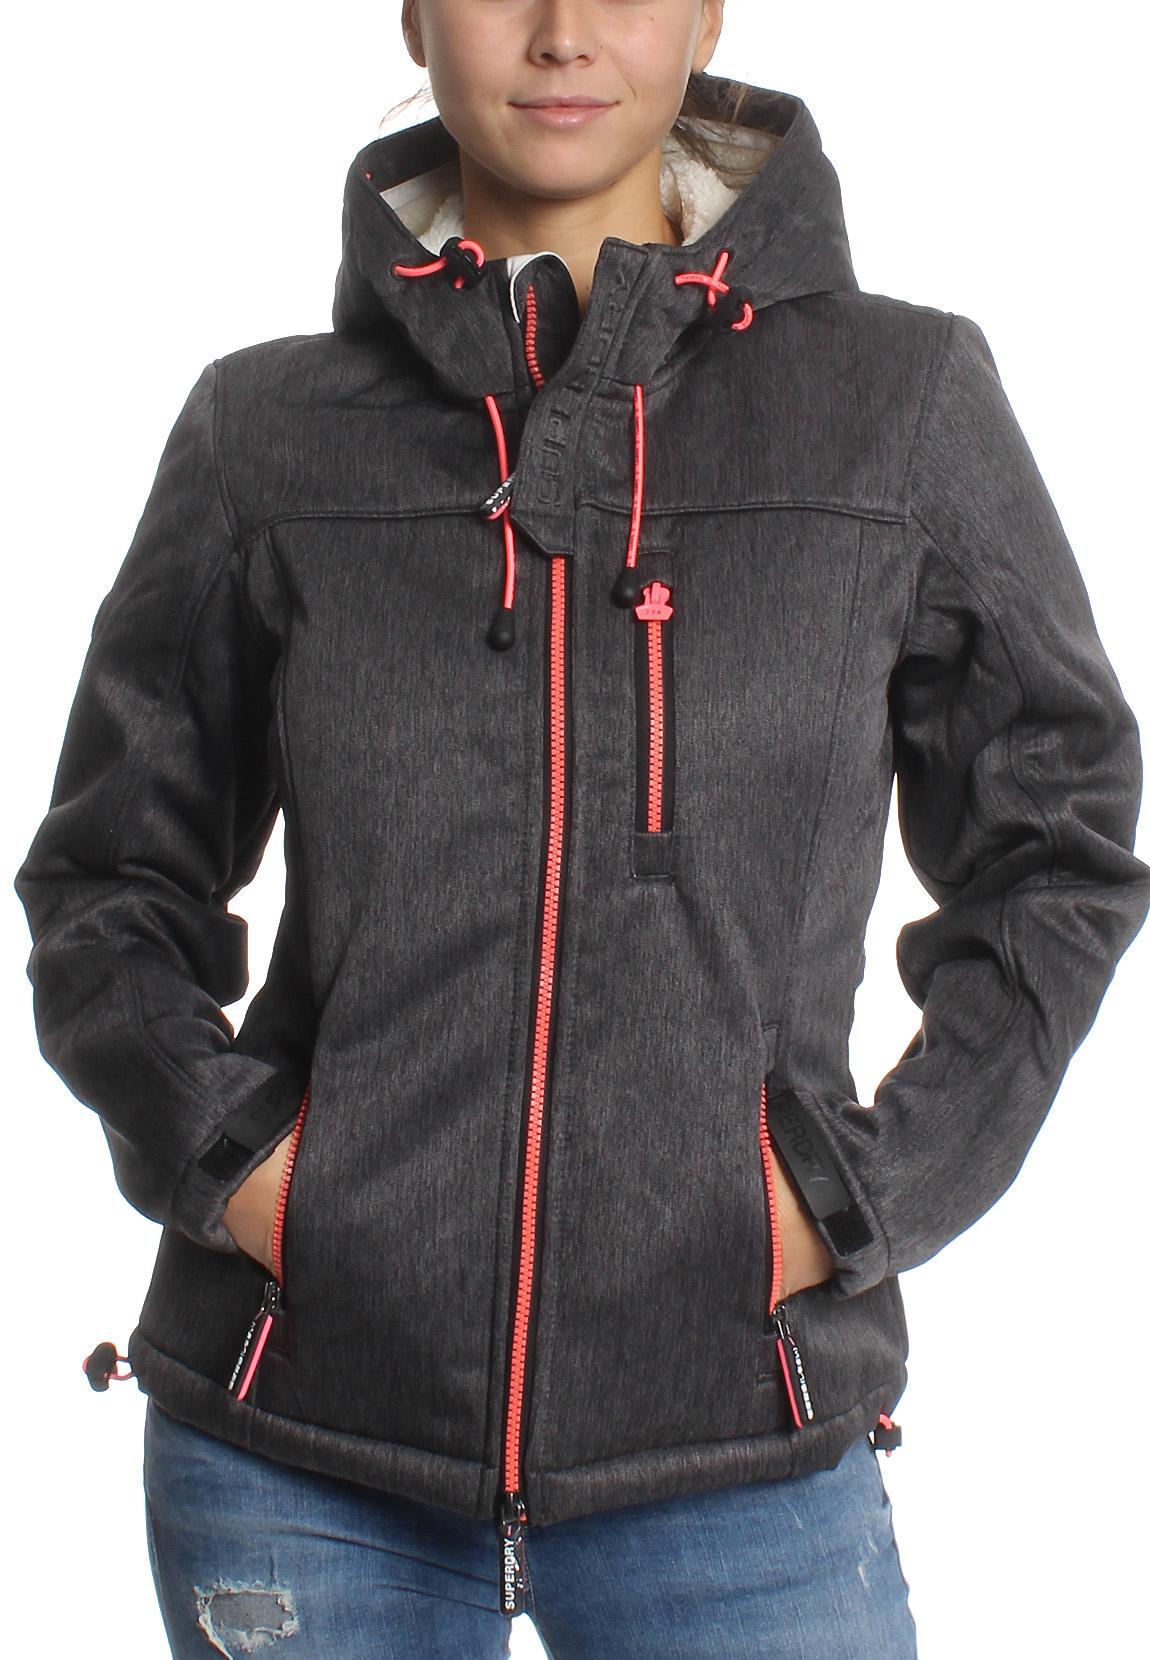 quality design fd0da 41378 Details about Superdry Jacket Women's Hooded Sherpa Windtrekker Black Grit  Candy Pink